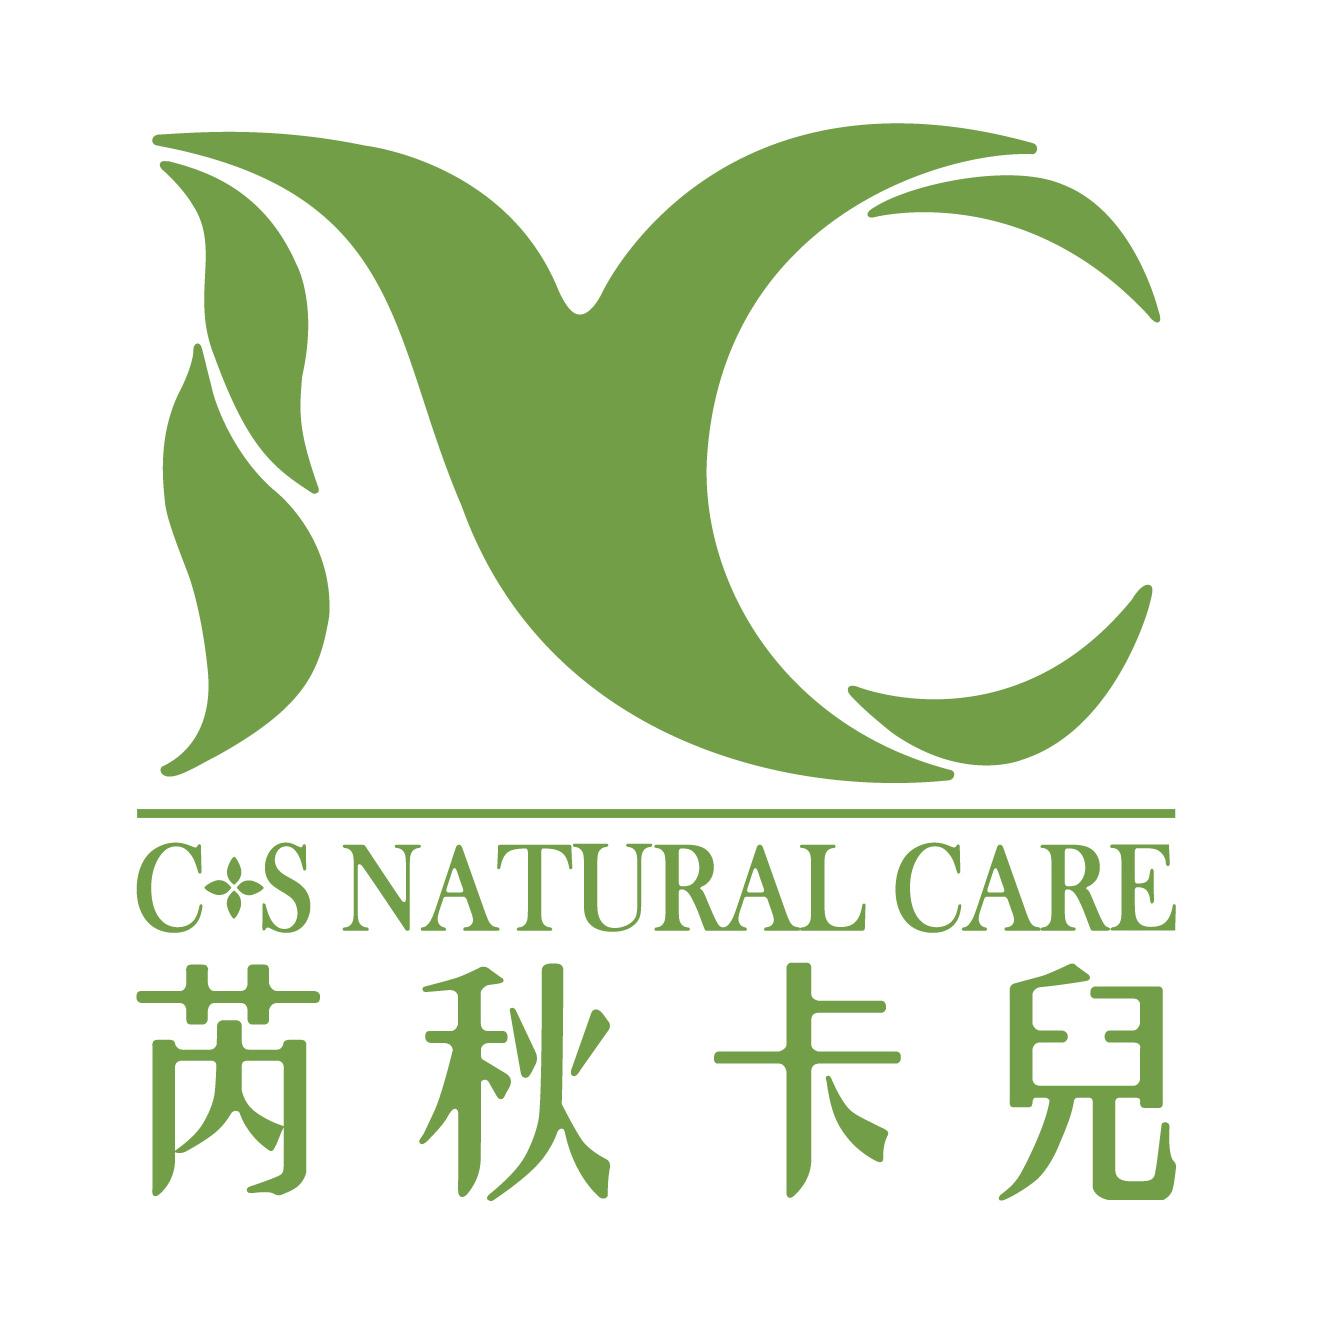 C+S International Co. Ltd